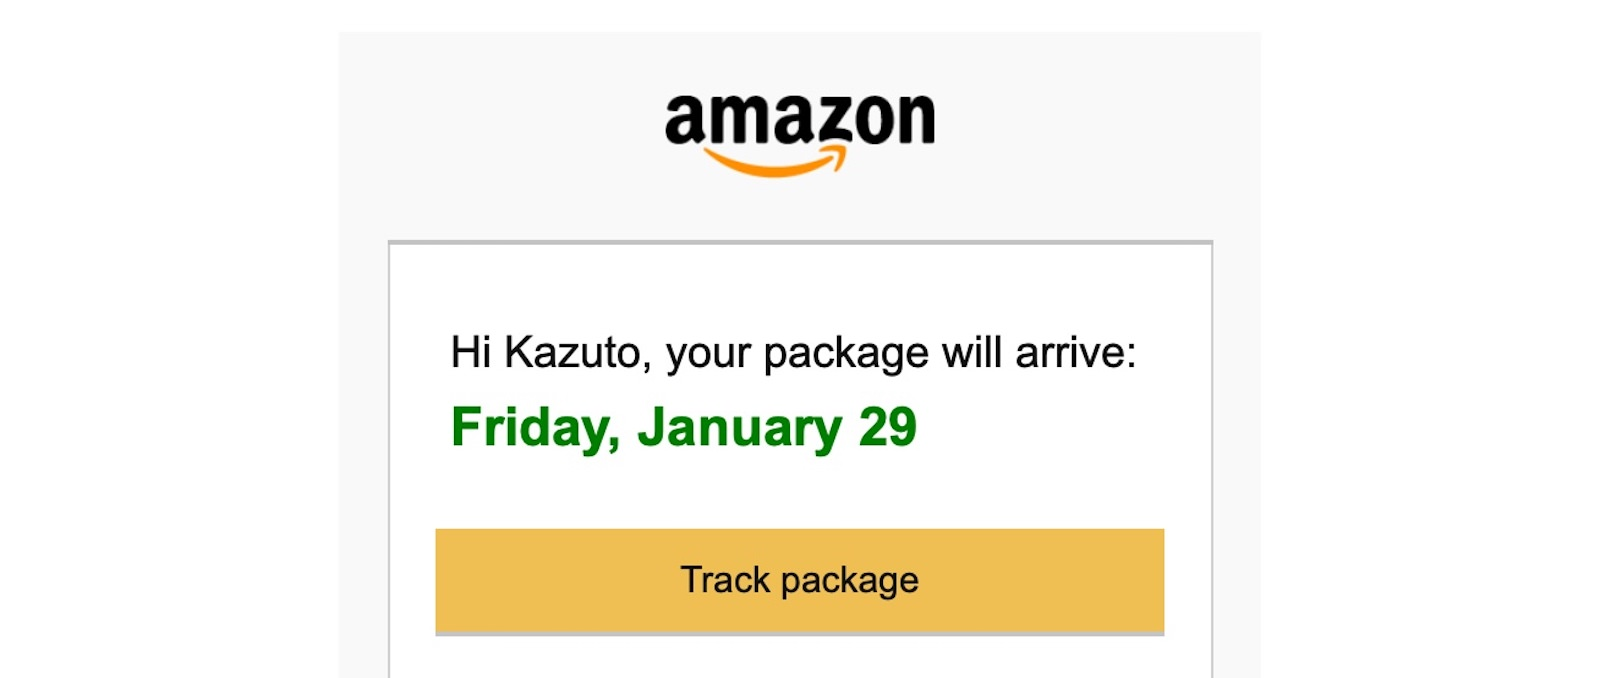 Amazon tracking information